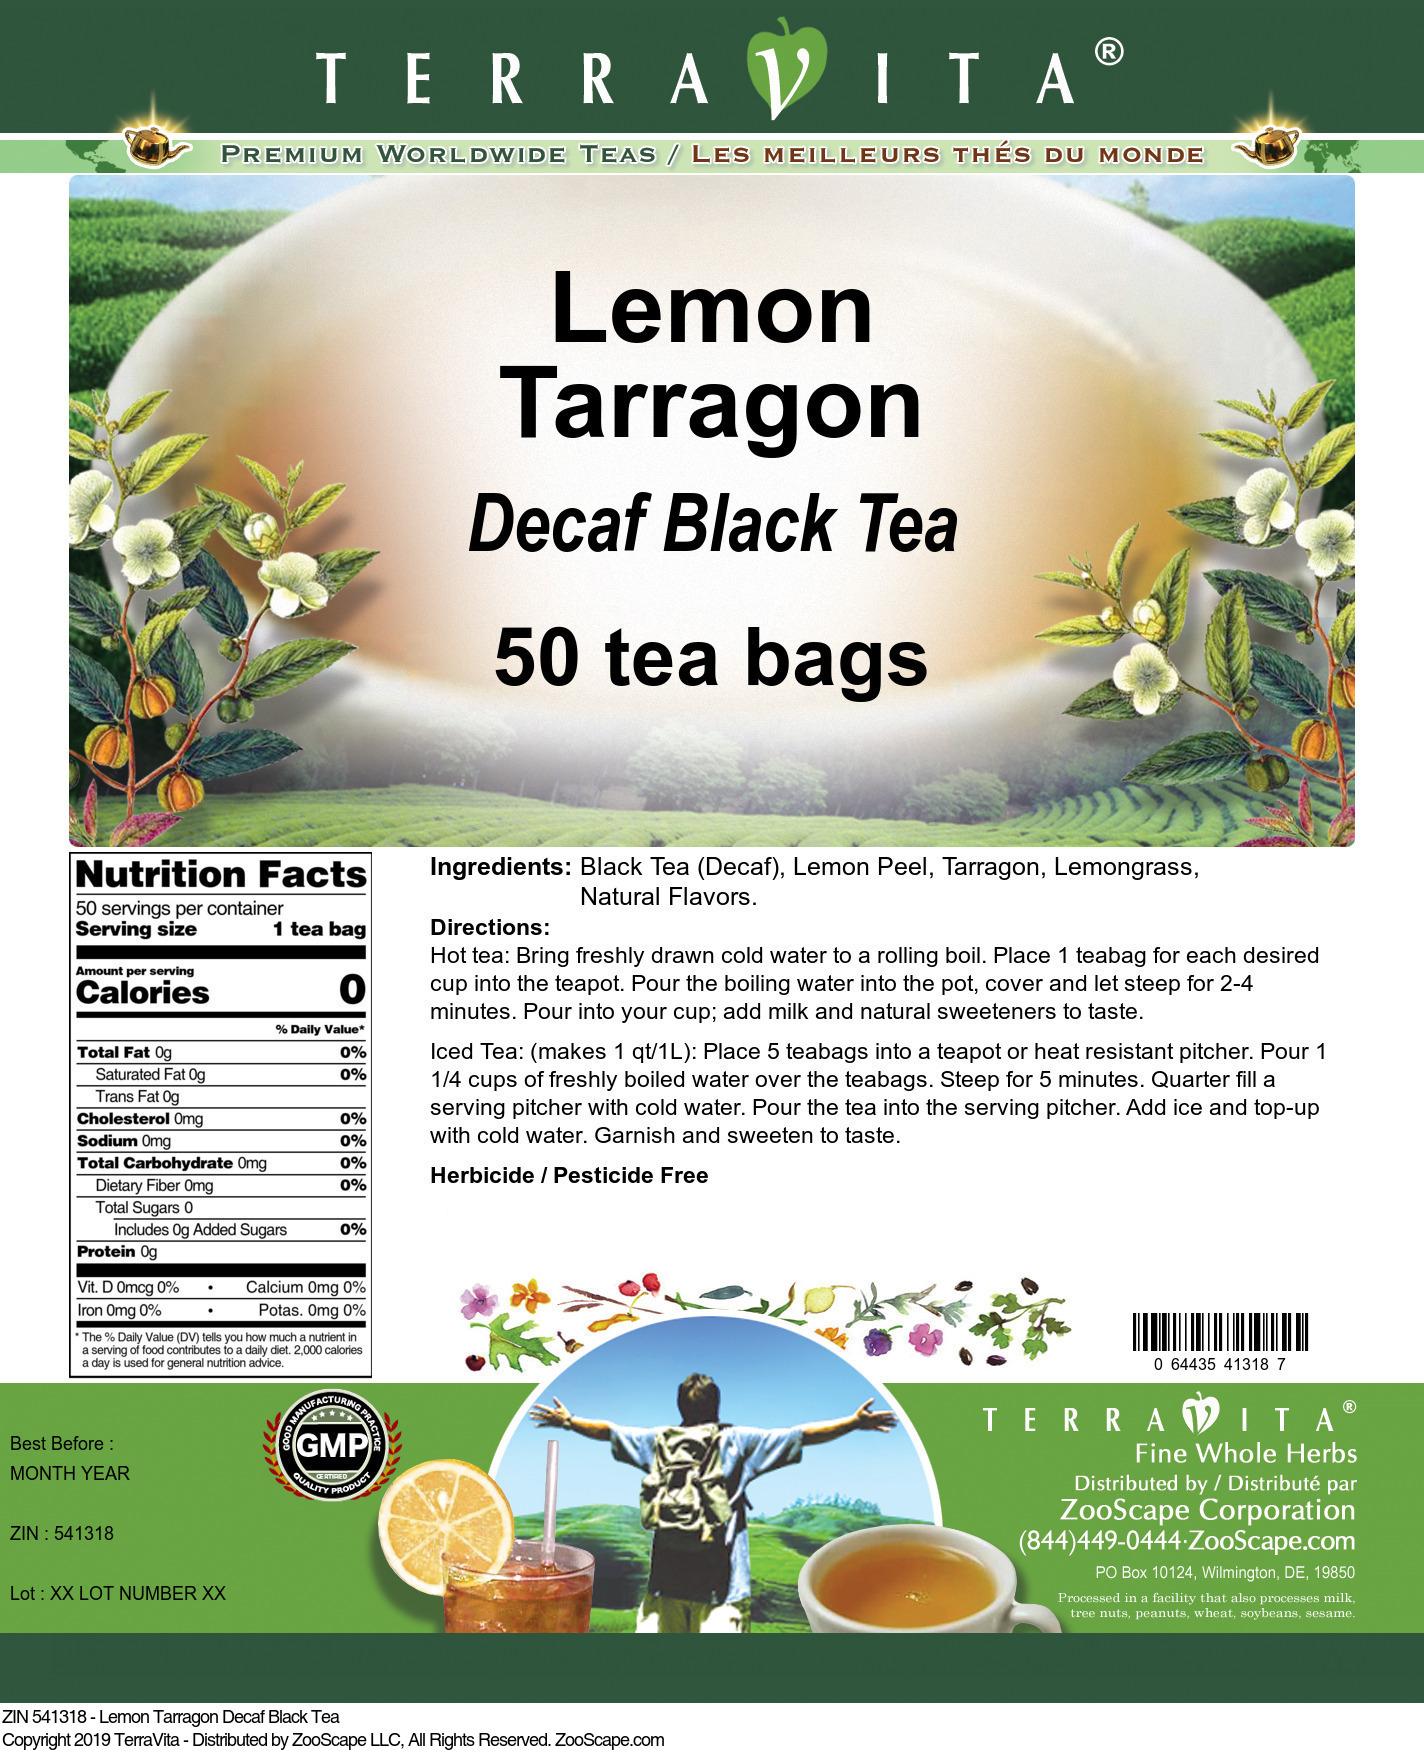 Lemon Tarragon Decaf Black Tea